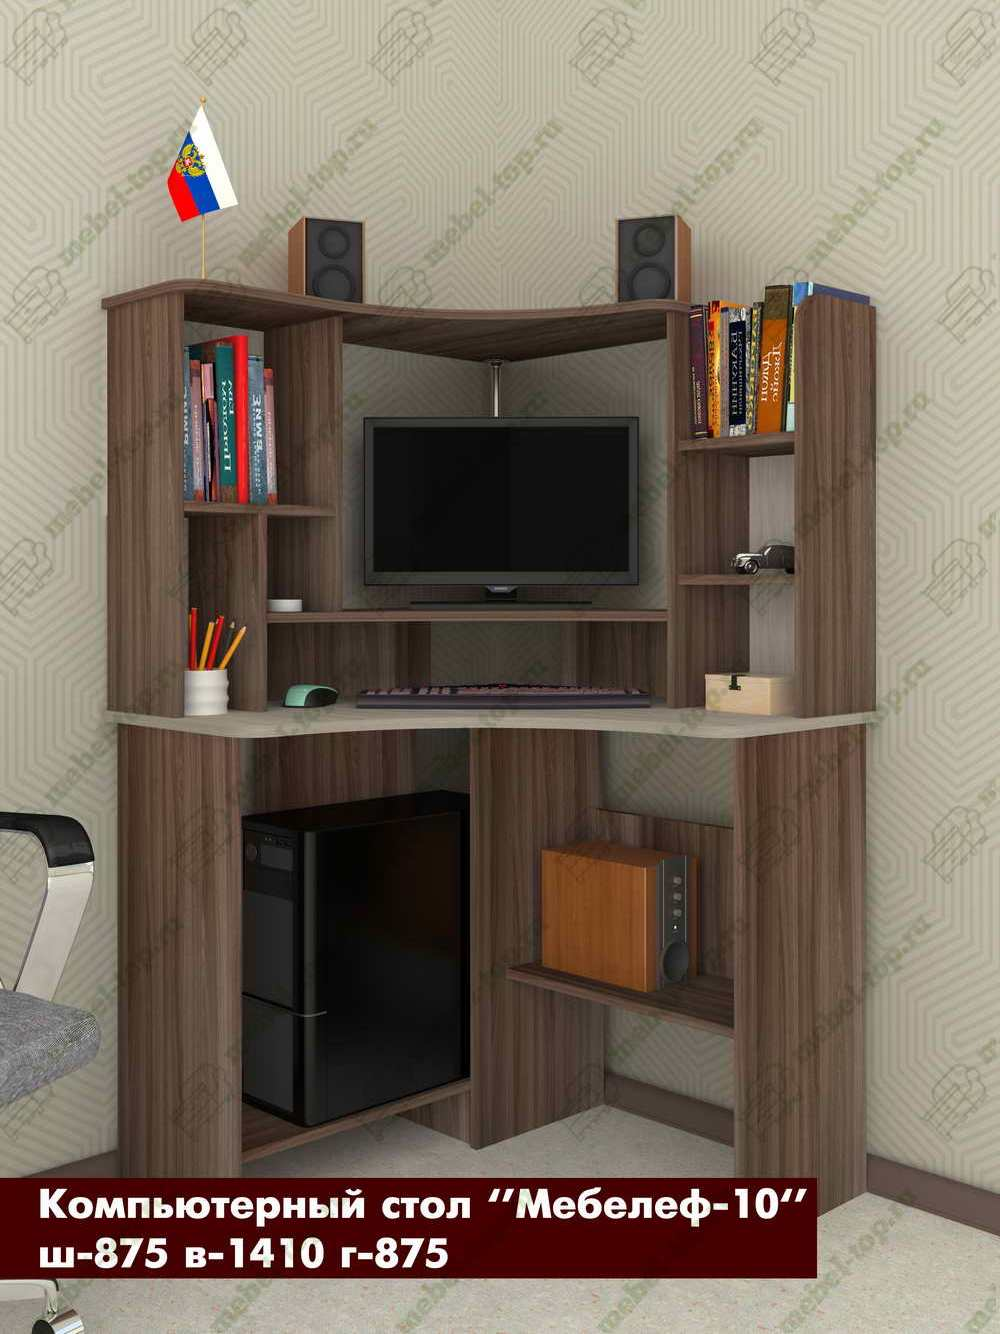 Компьютерный стол Мебелеф-10 стенка мебелеф 5